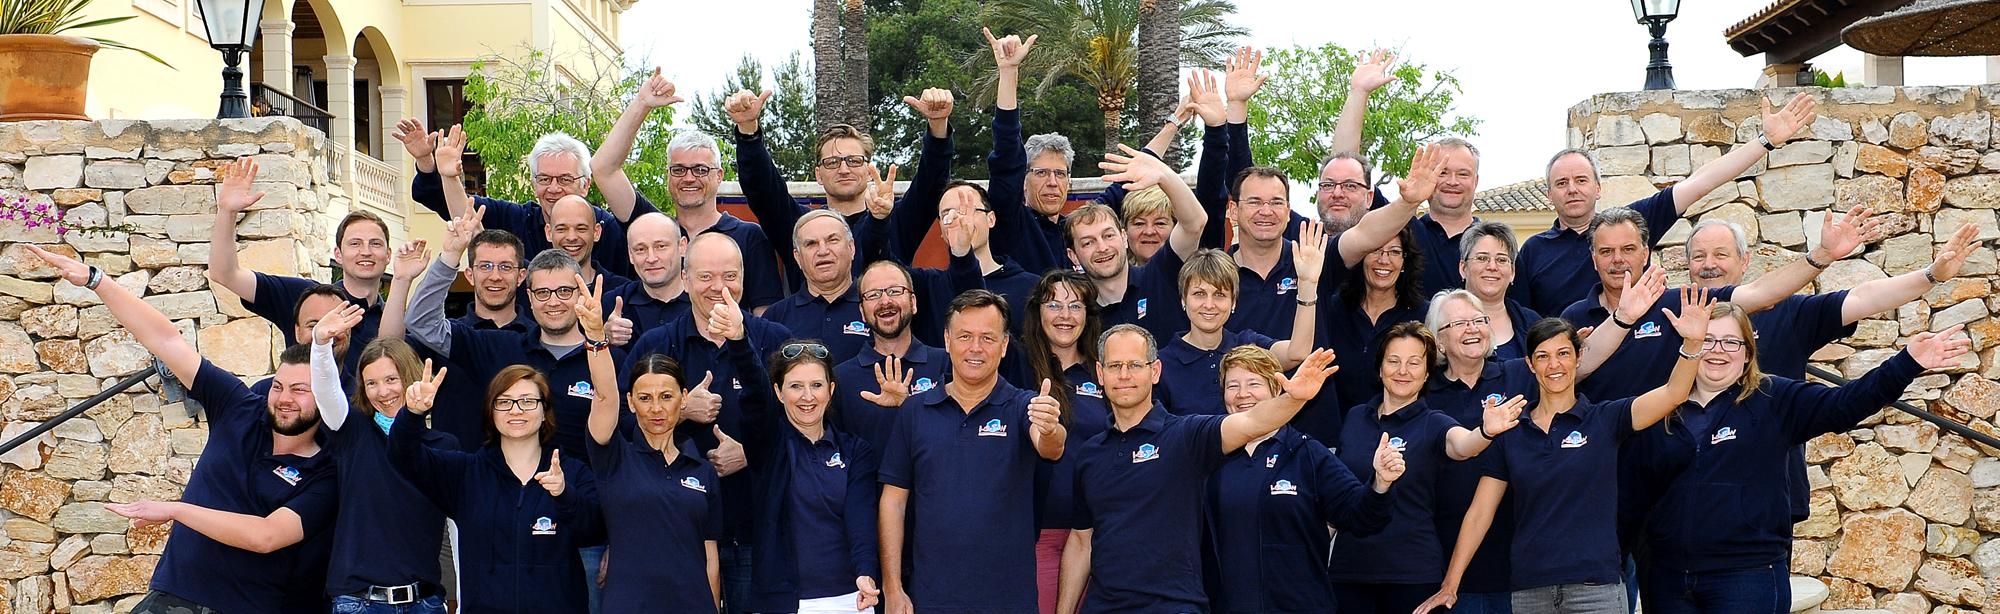 Mitarbeiter Mallorca -Gruppenfoto